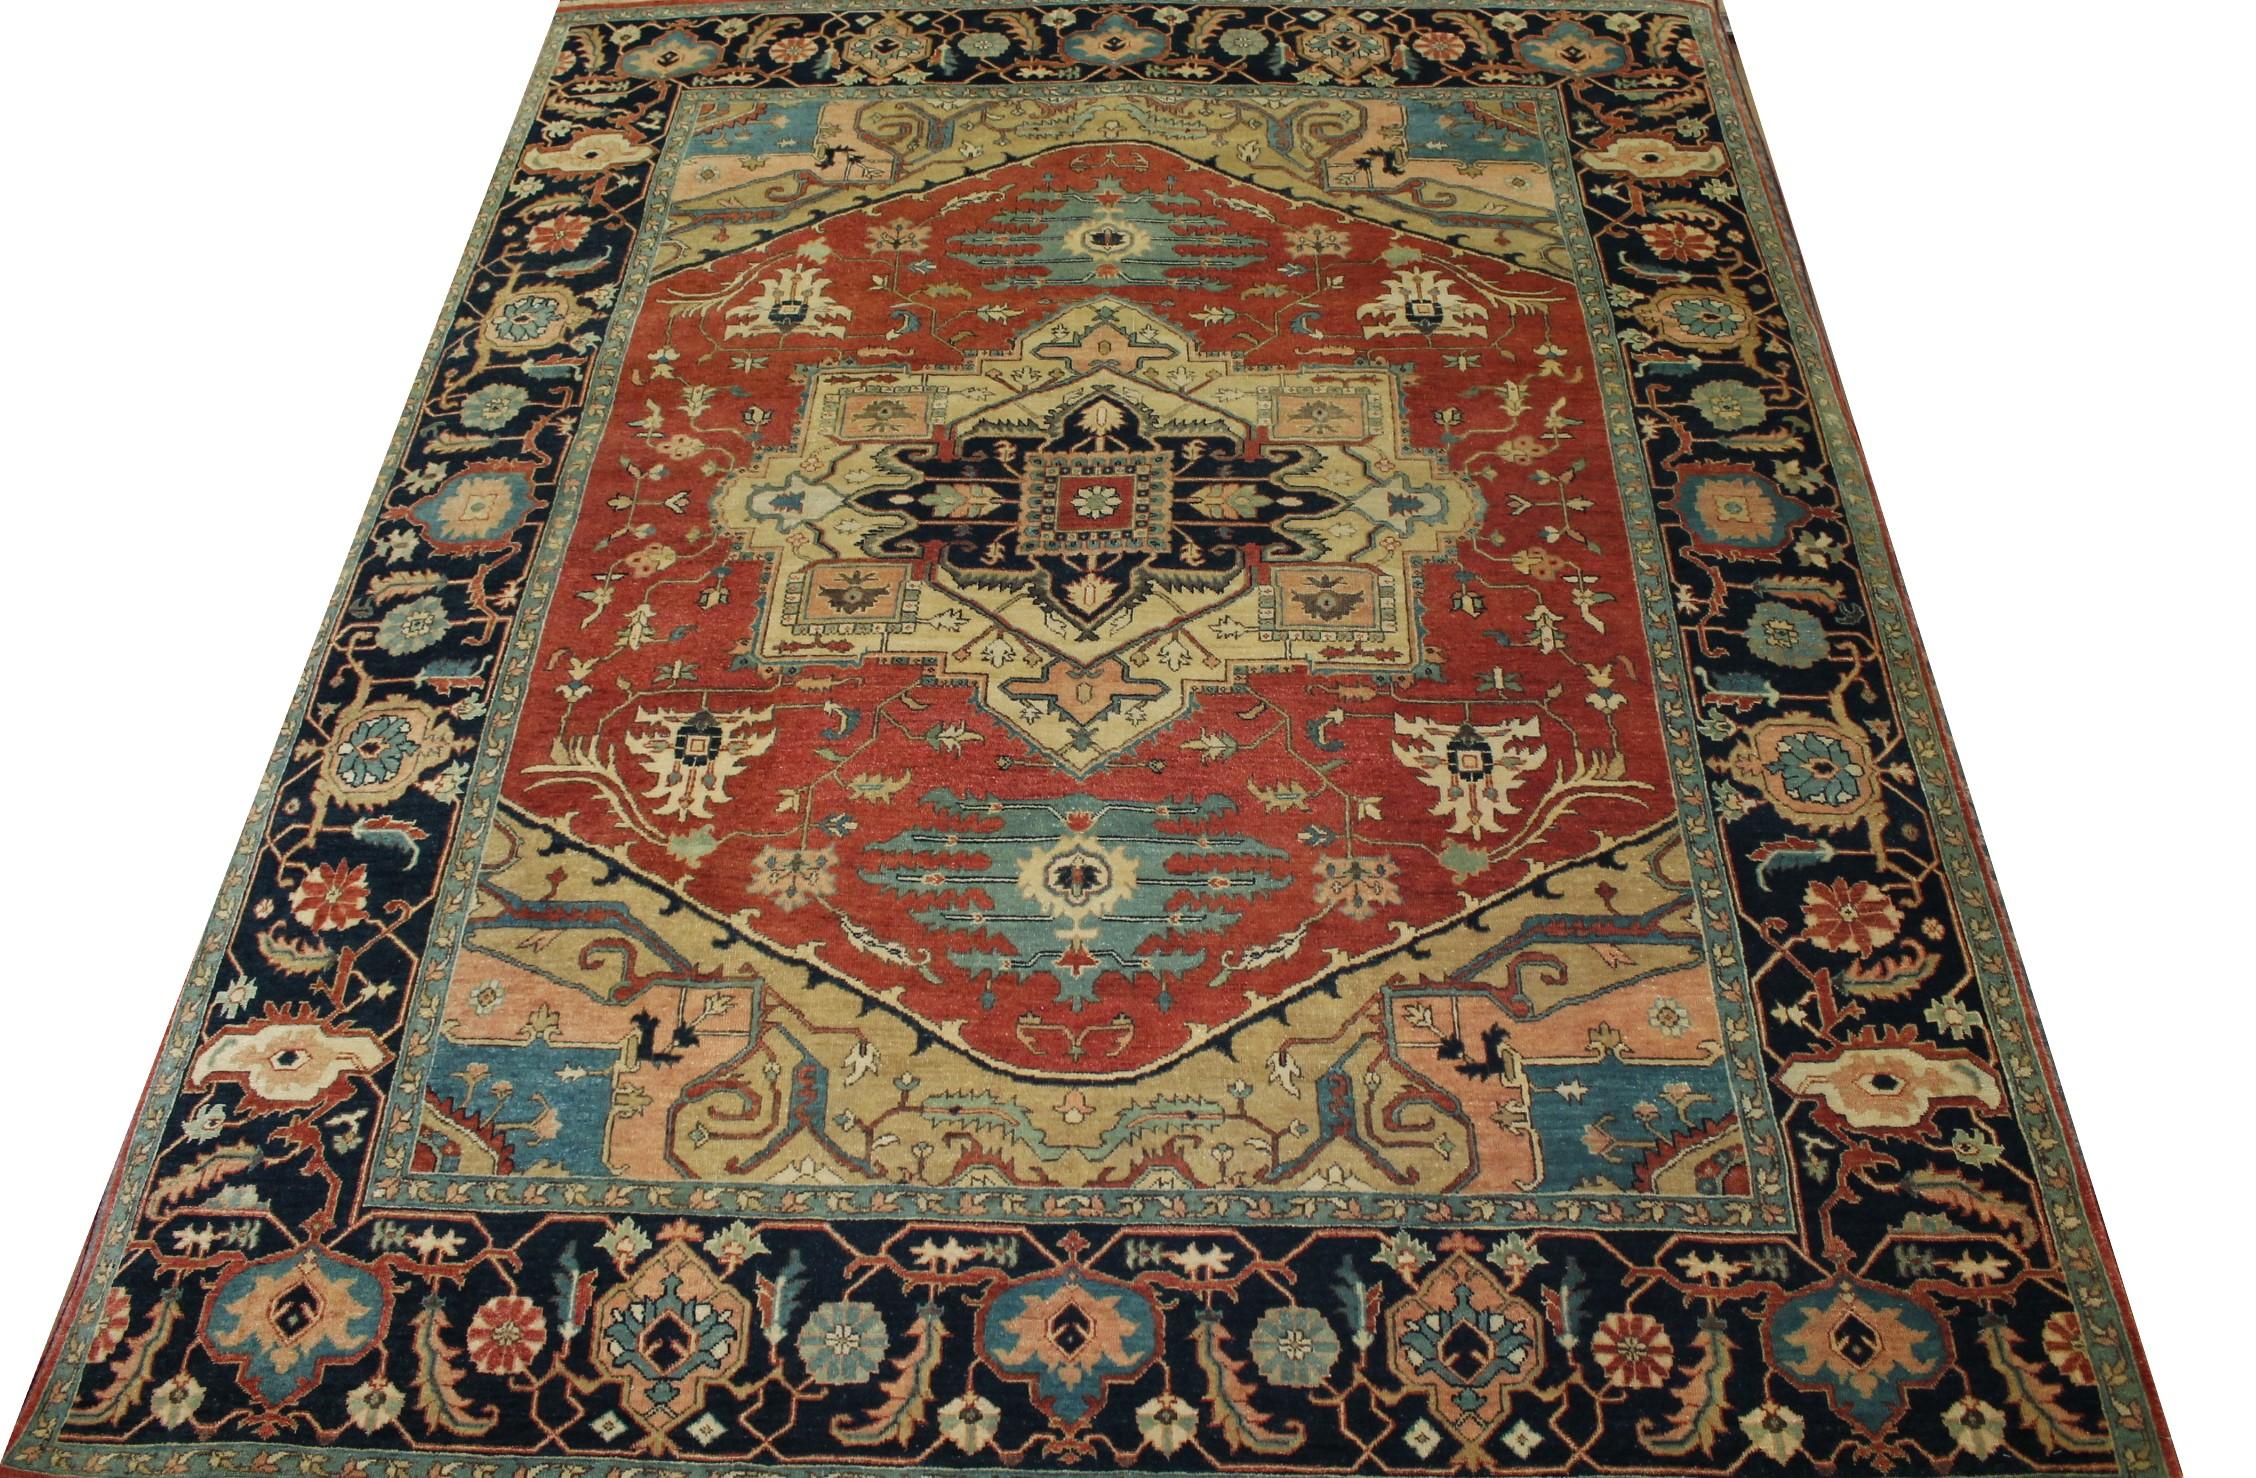 8x10 Heriz/Serapi Hand Knotted Wool Area Rug - MR023566